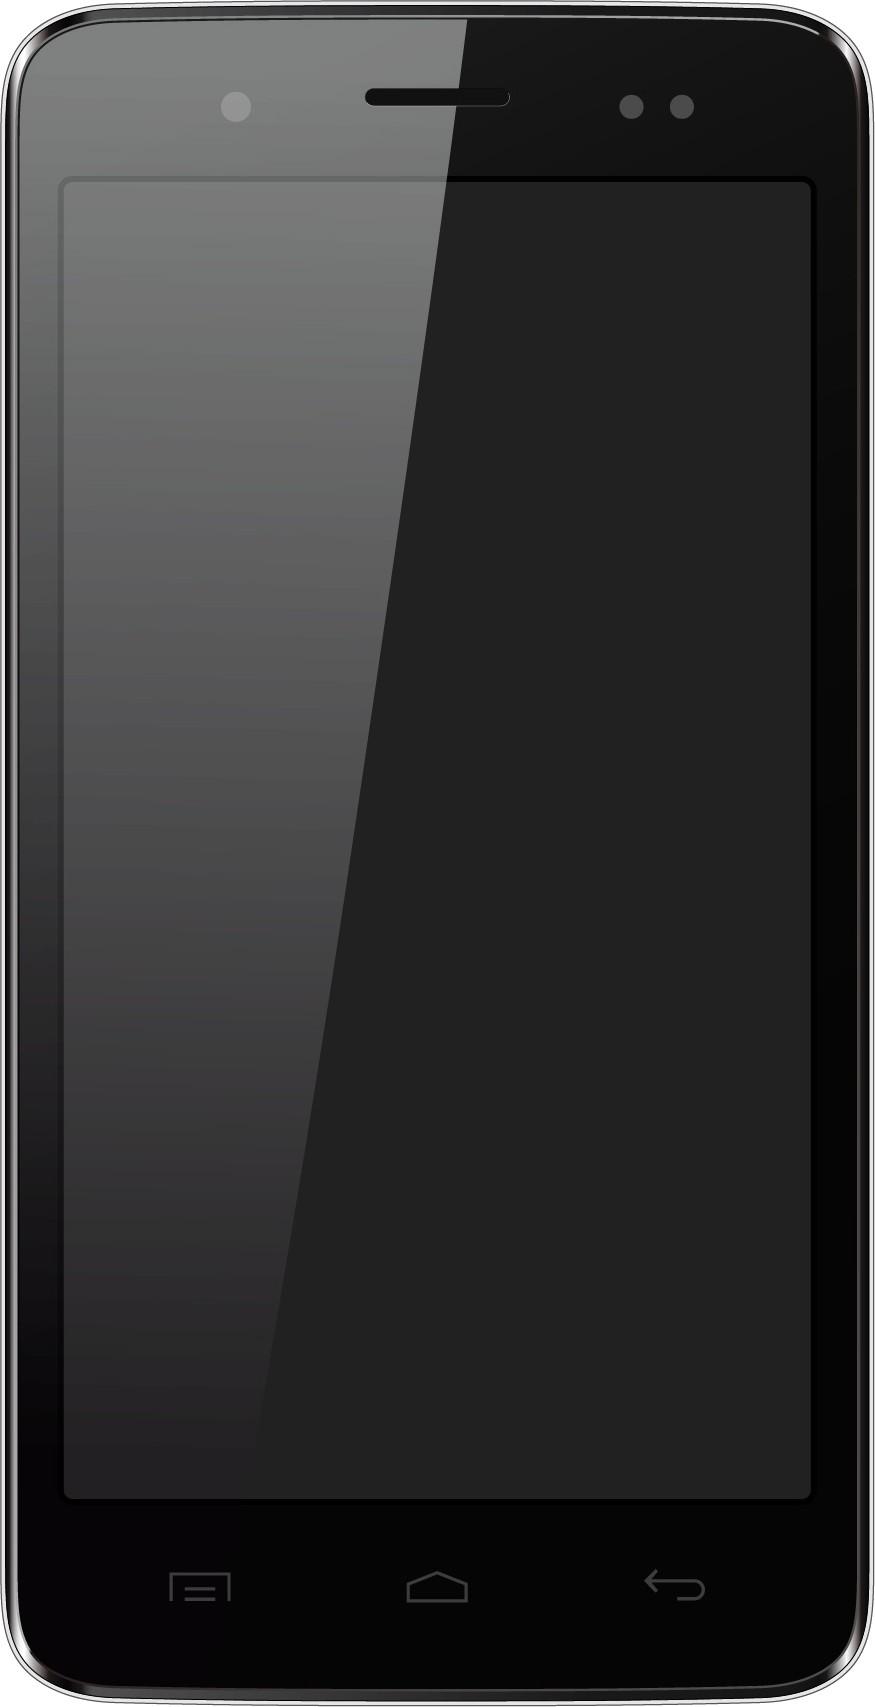 Micromax Bolt A069 (White, 4 GB)(512 MB RAM)